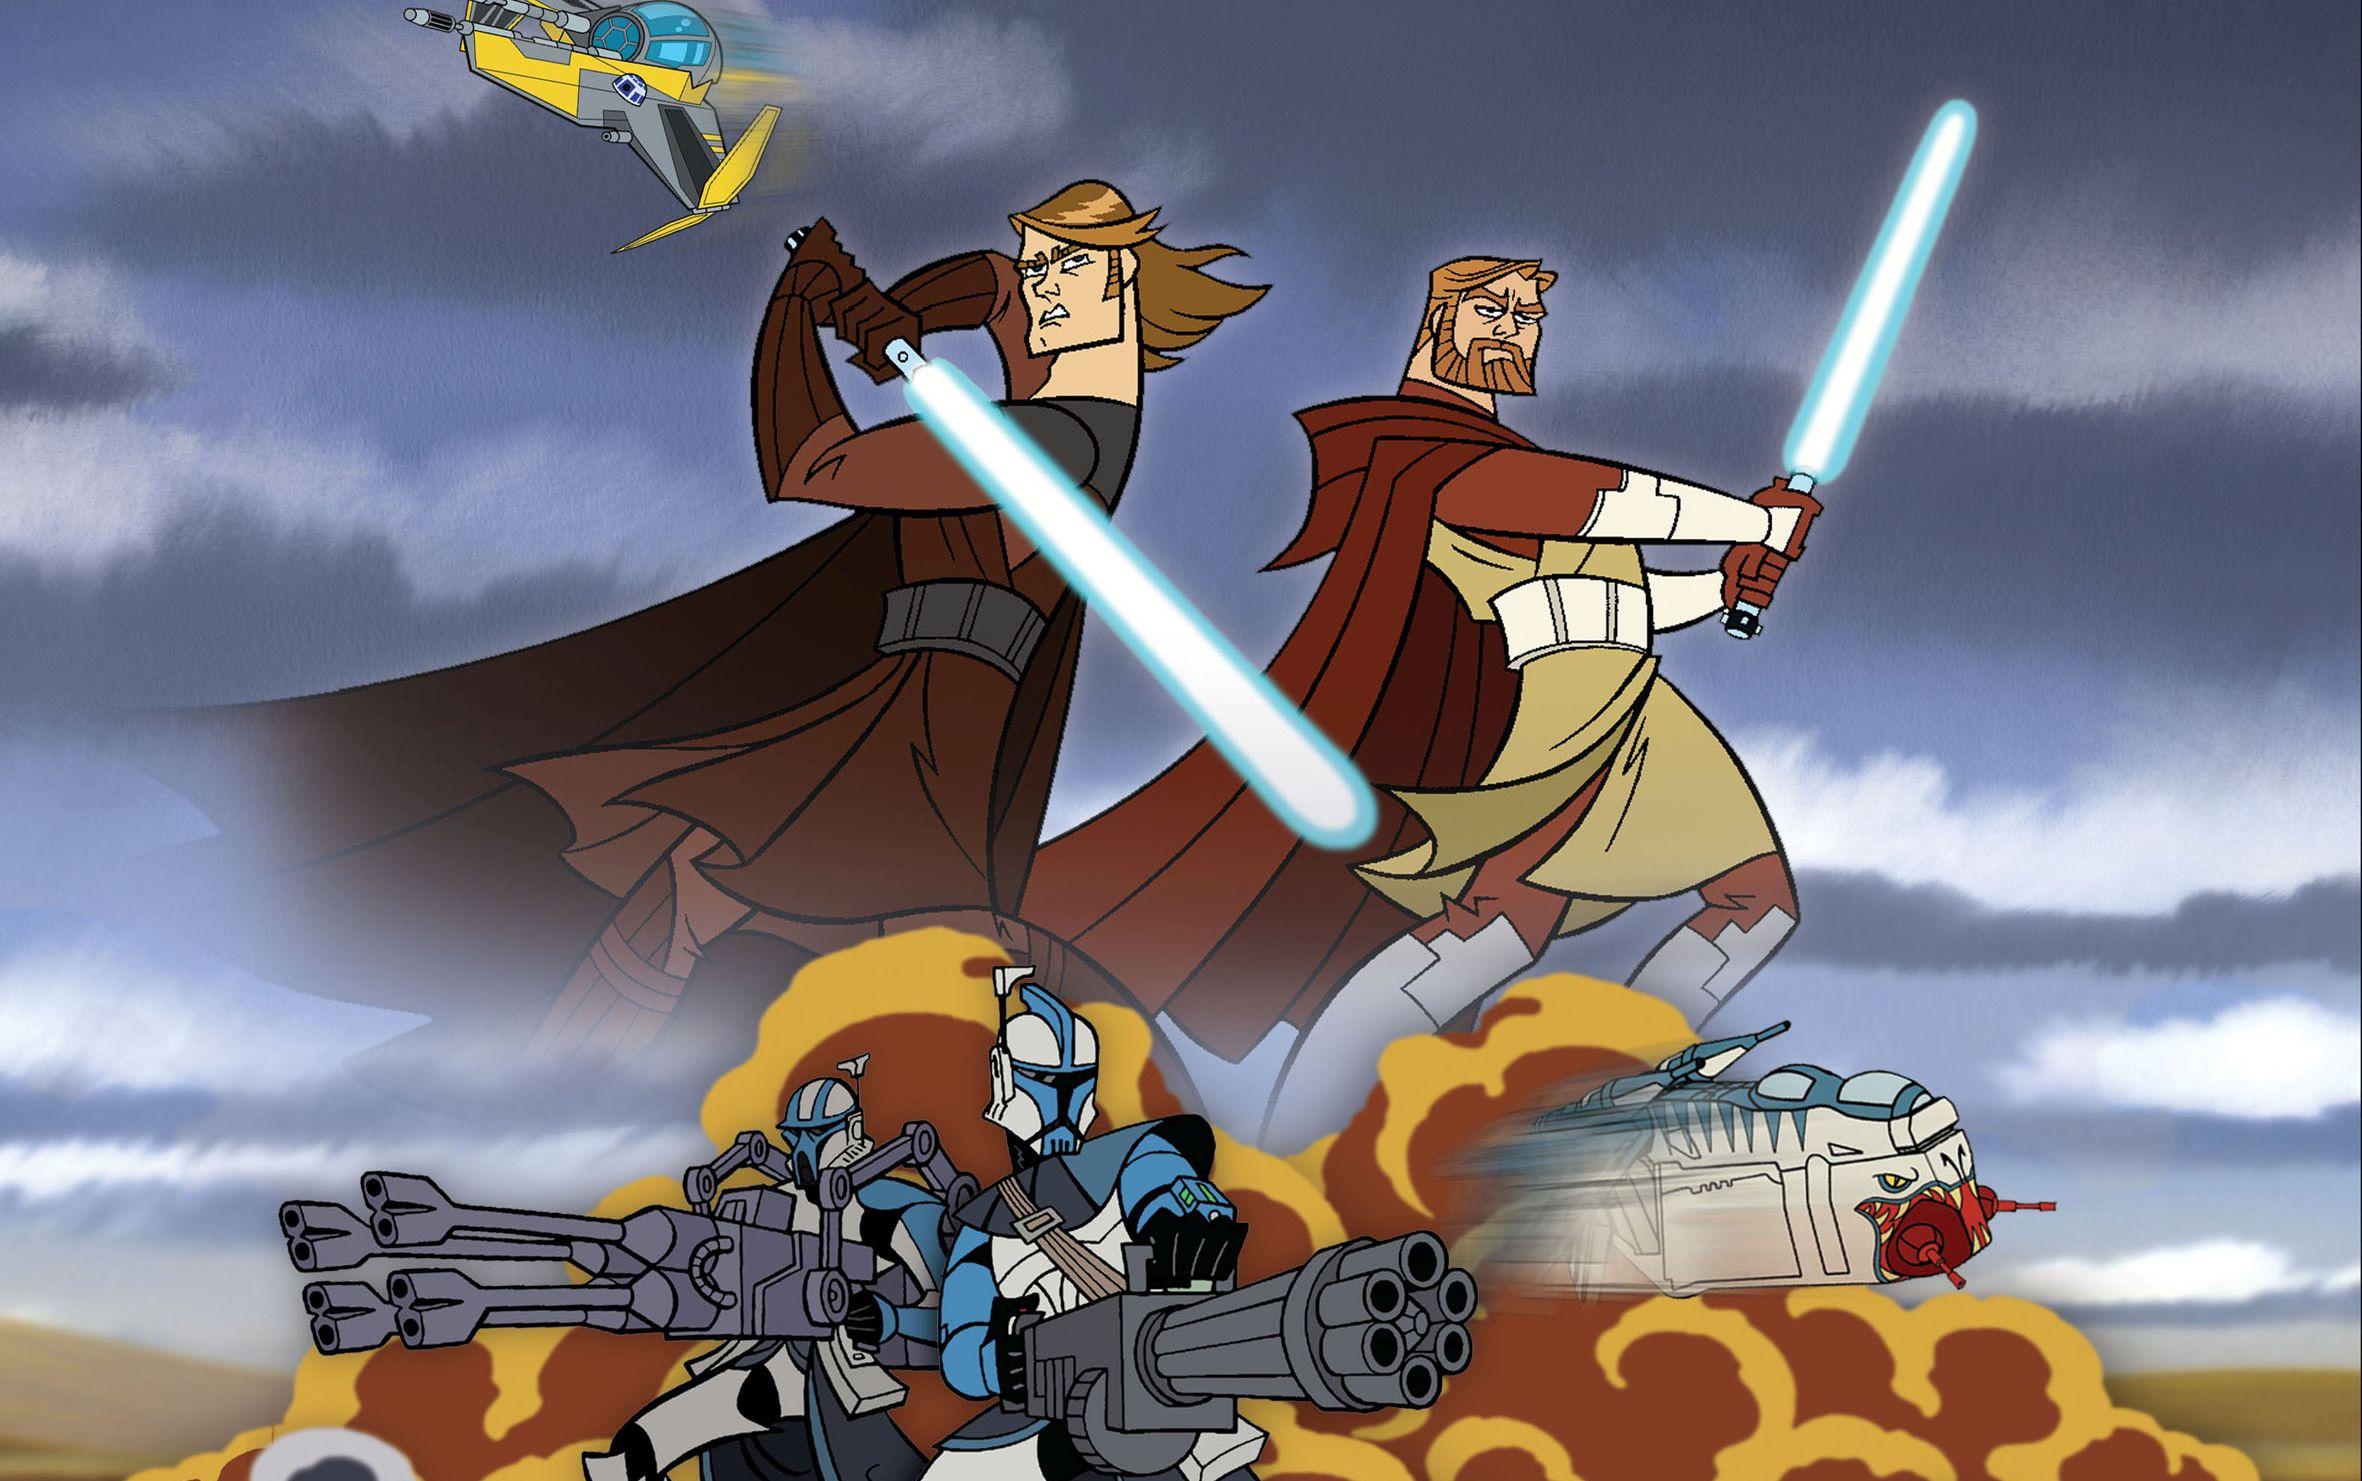 Star Wars The Clone Wars Hd Wallpaper Background Image 2362x1481